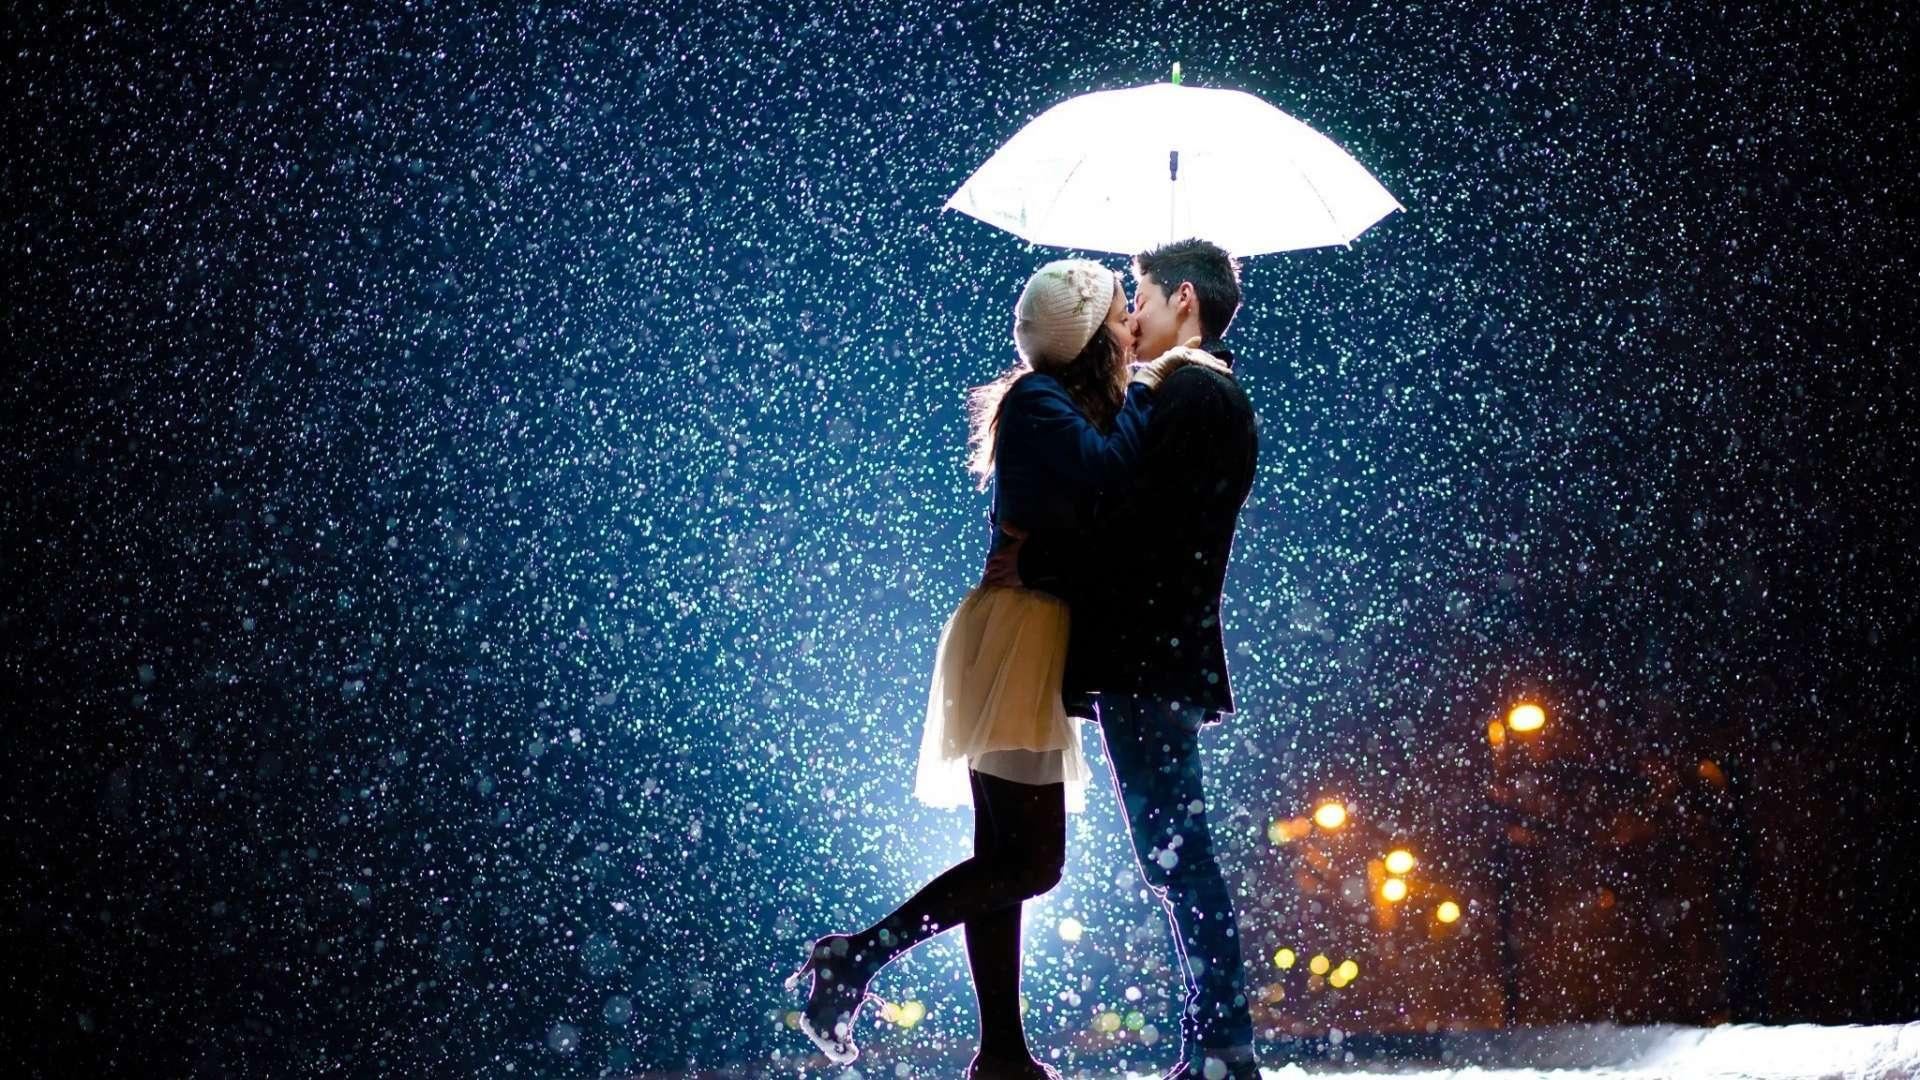 Cute-Love-Full-HD-Download-Desktop-Mobile-Backgrounds-wallpaper-wp3404331